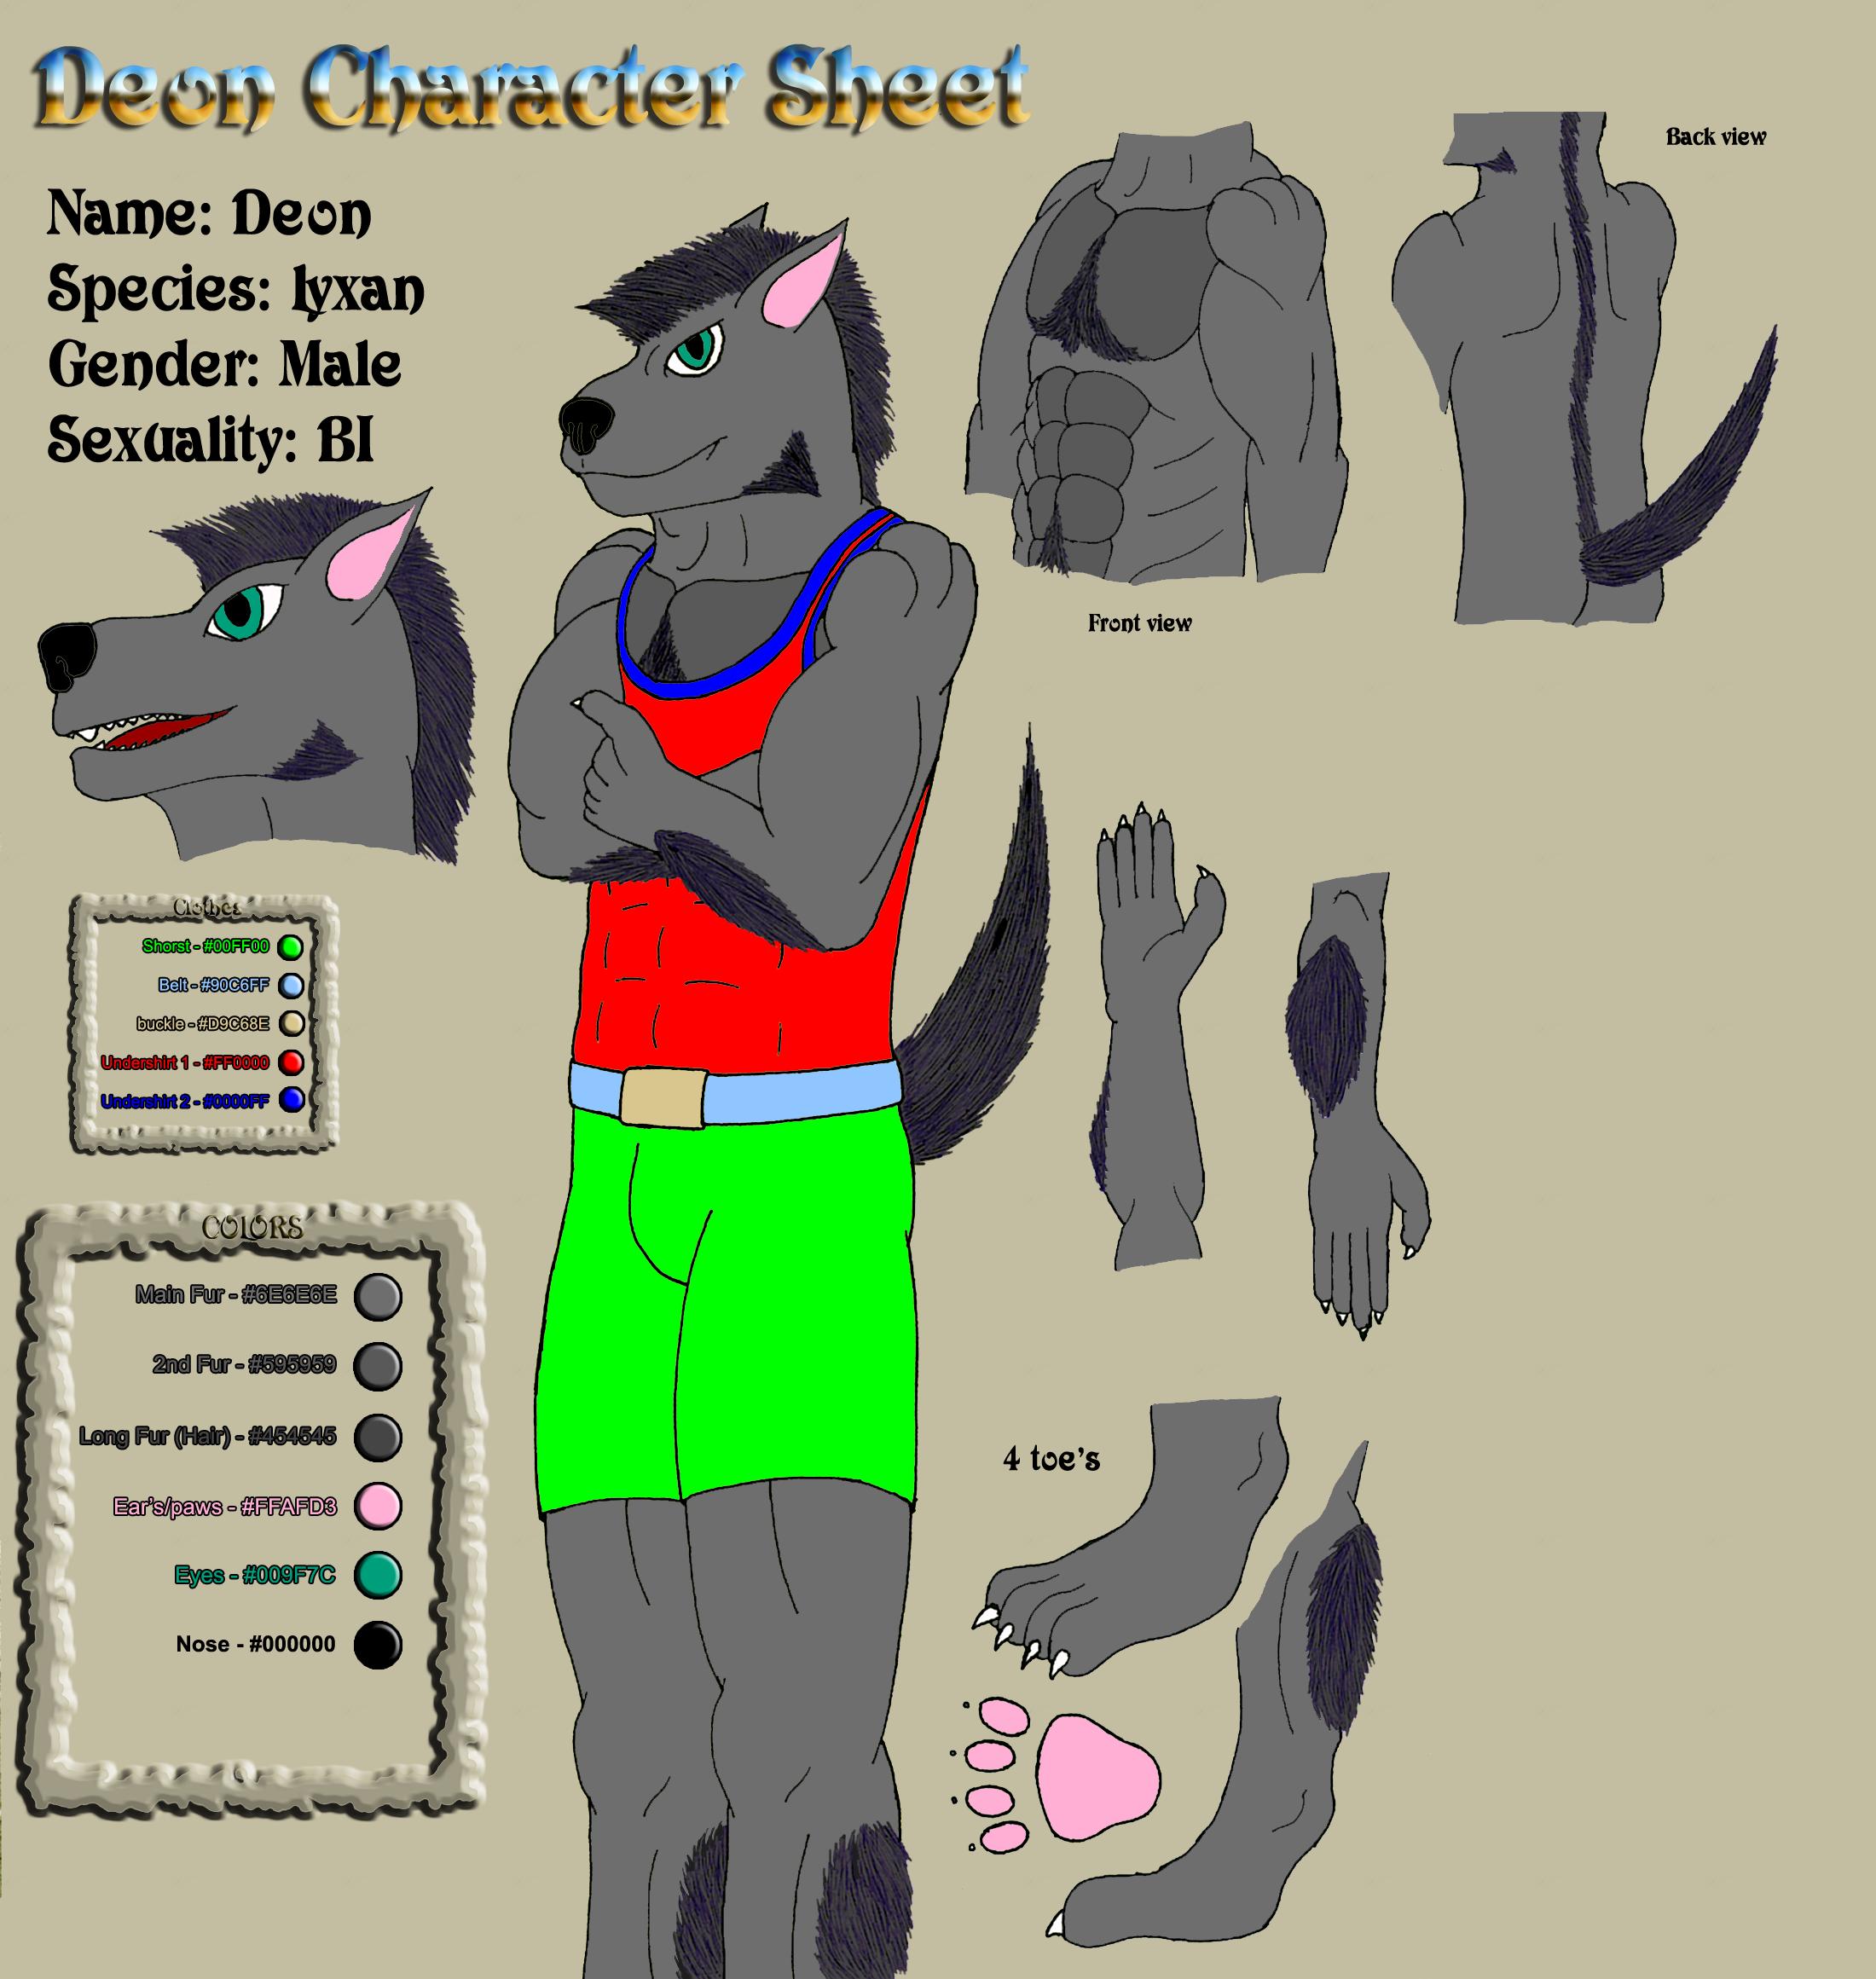 Character Sheet - Deon